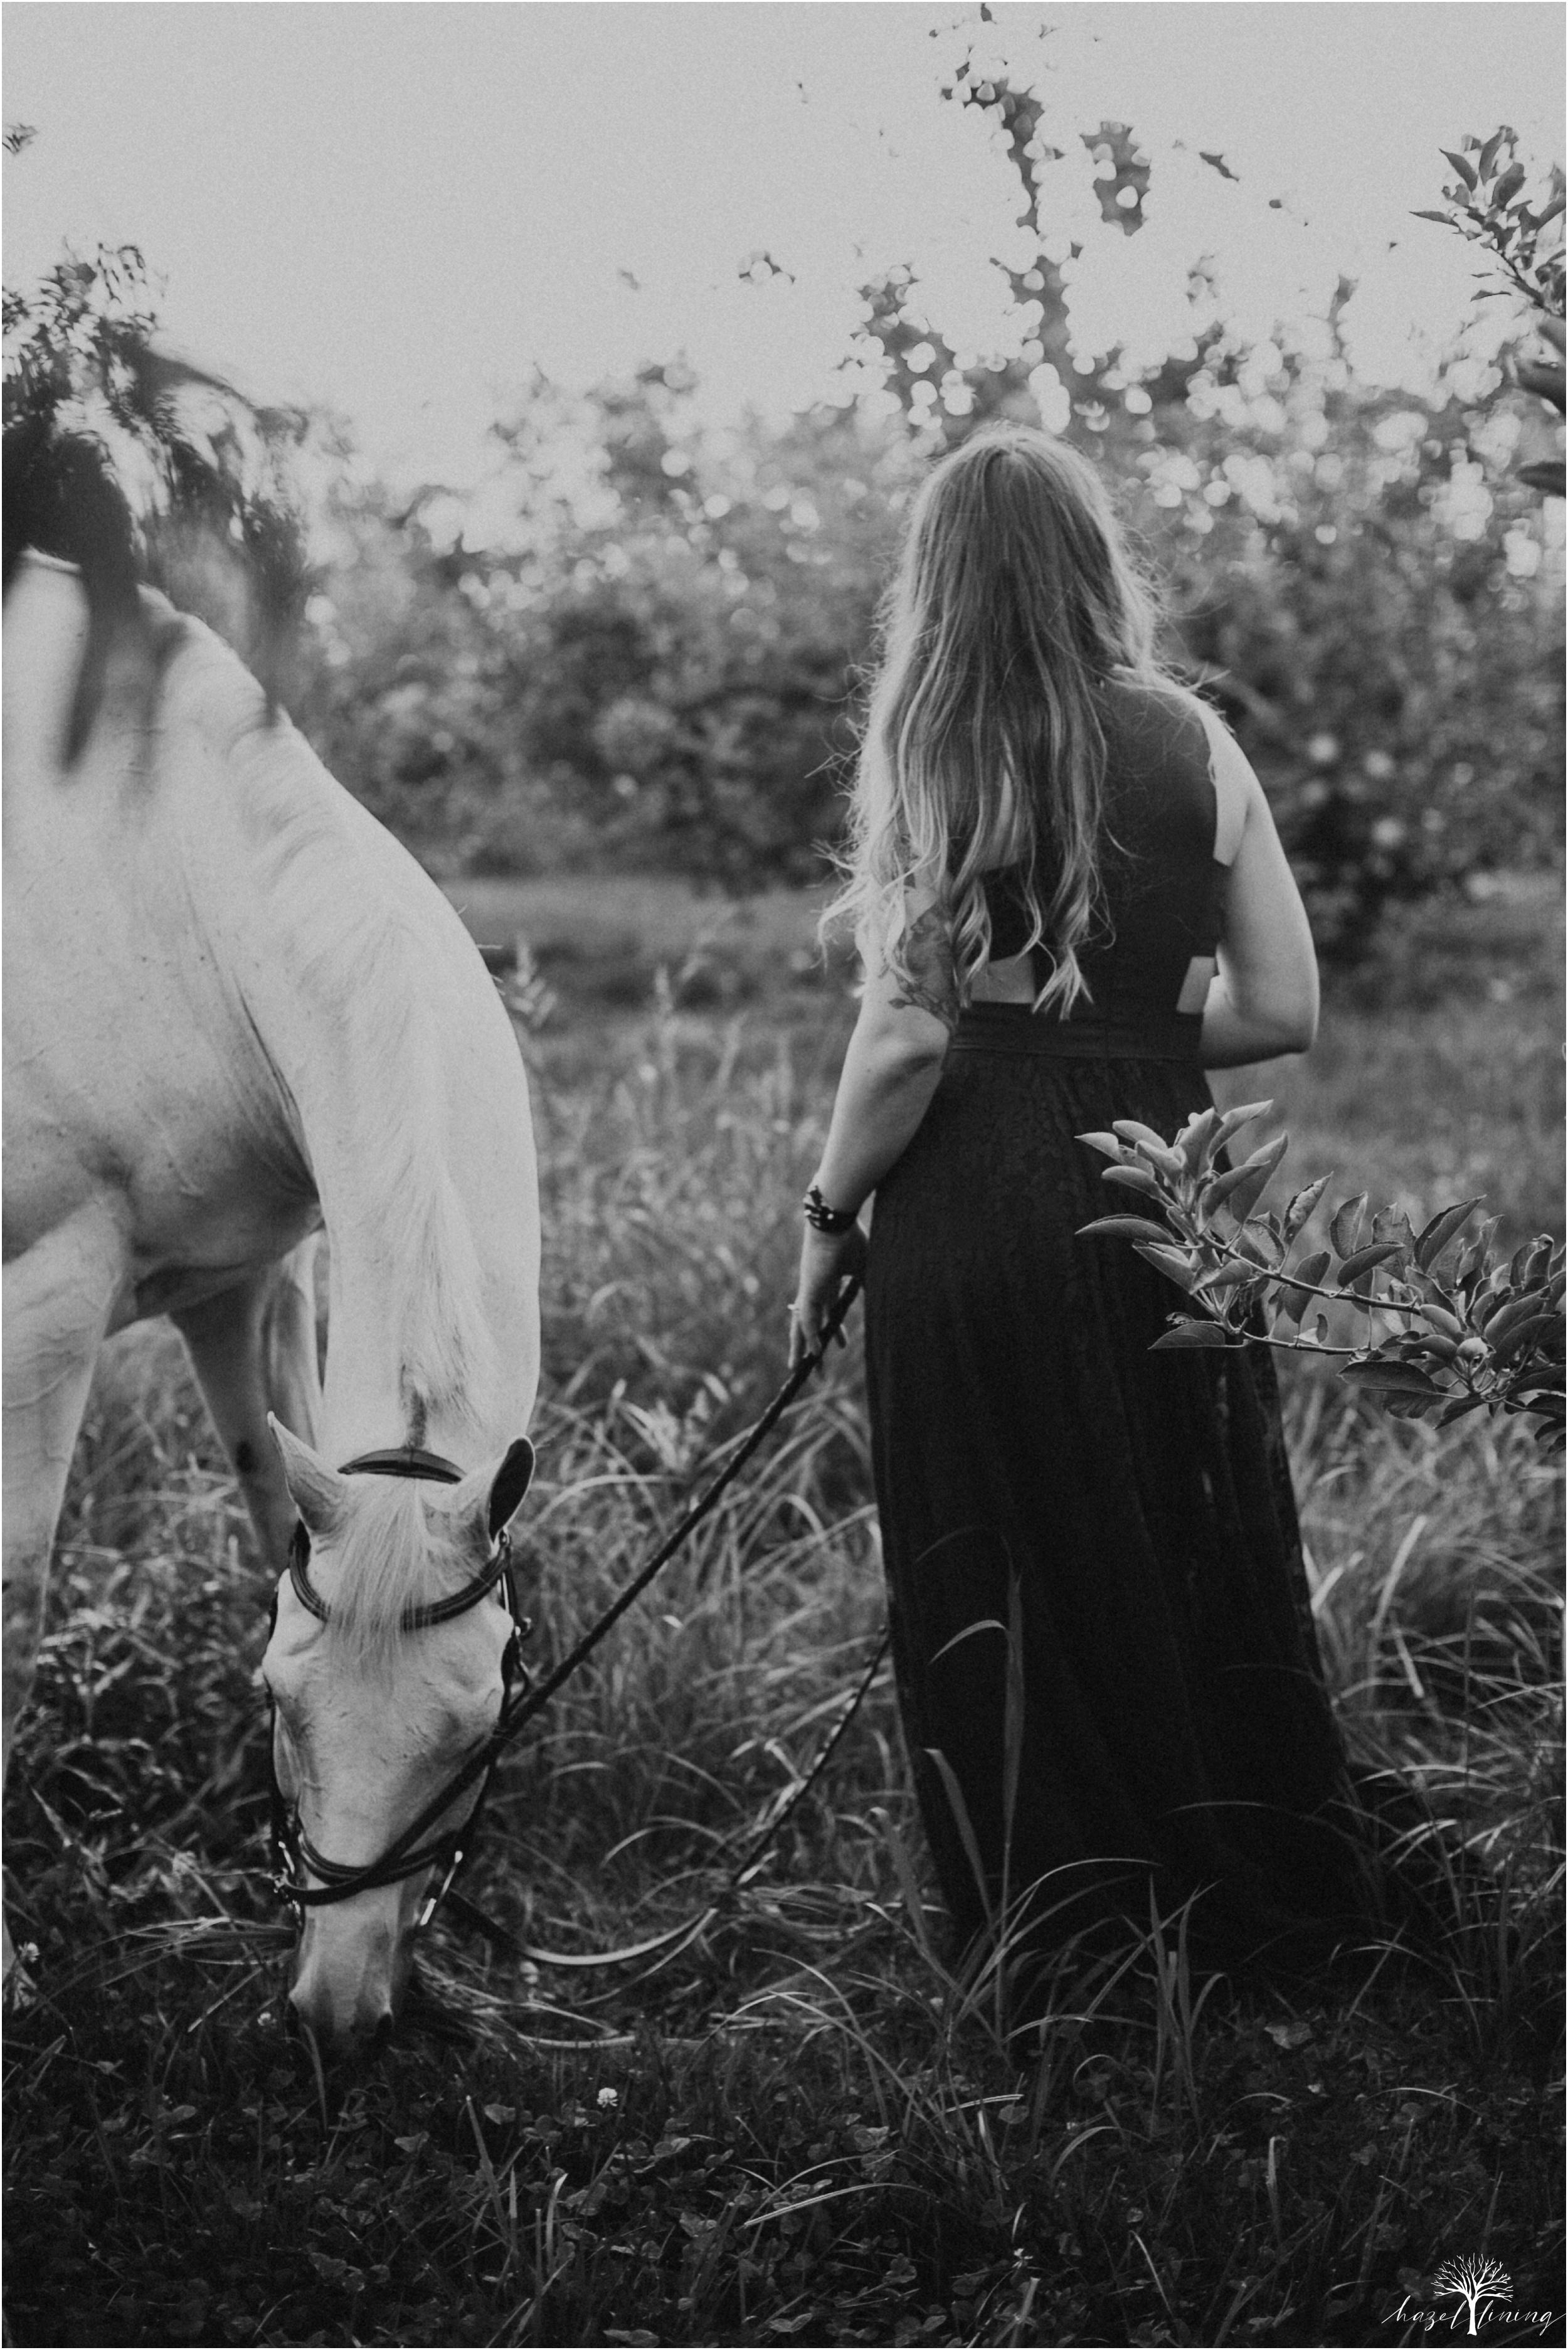 taylor-adams-and-horse-delaware-valley-university-delval-summer-equestrian-portrait-session-hazel-lining-photography-destination-elopement-wedding-engagement-photography_0076.jpg